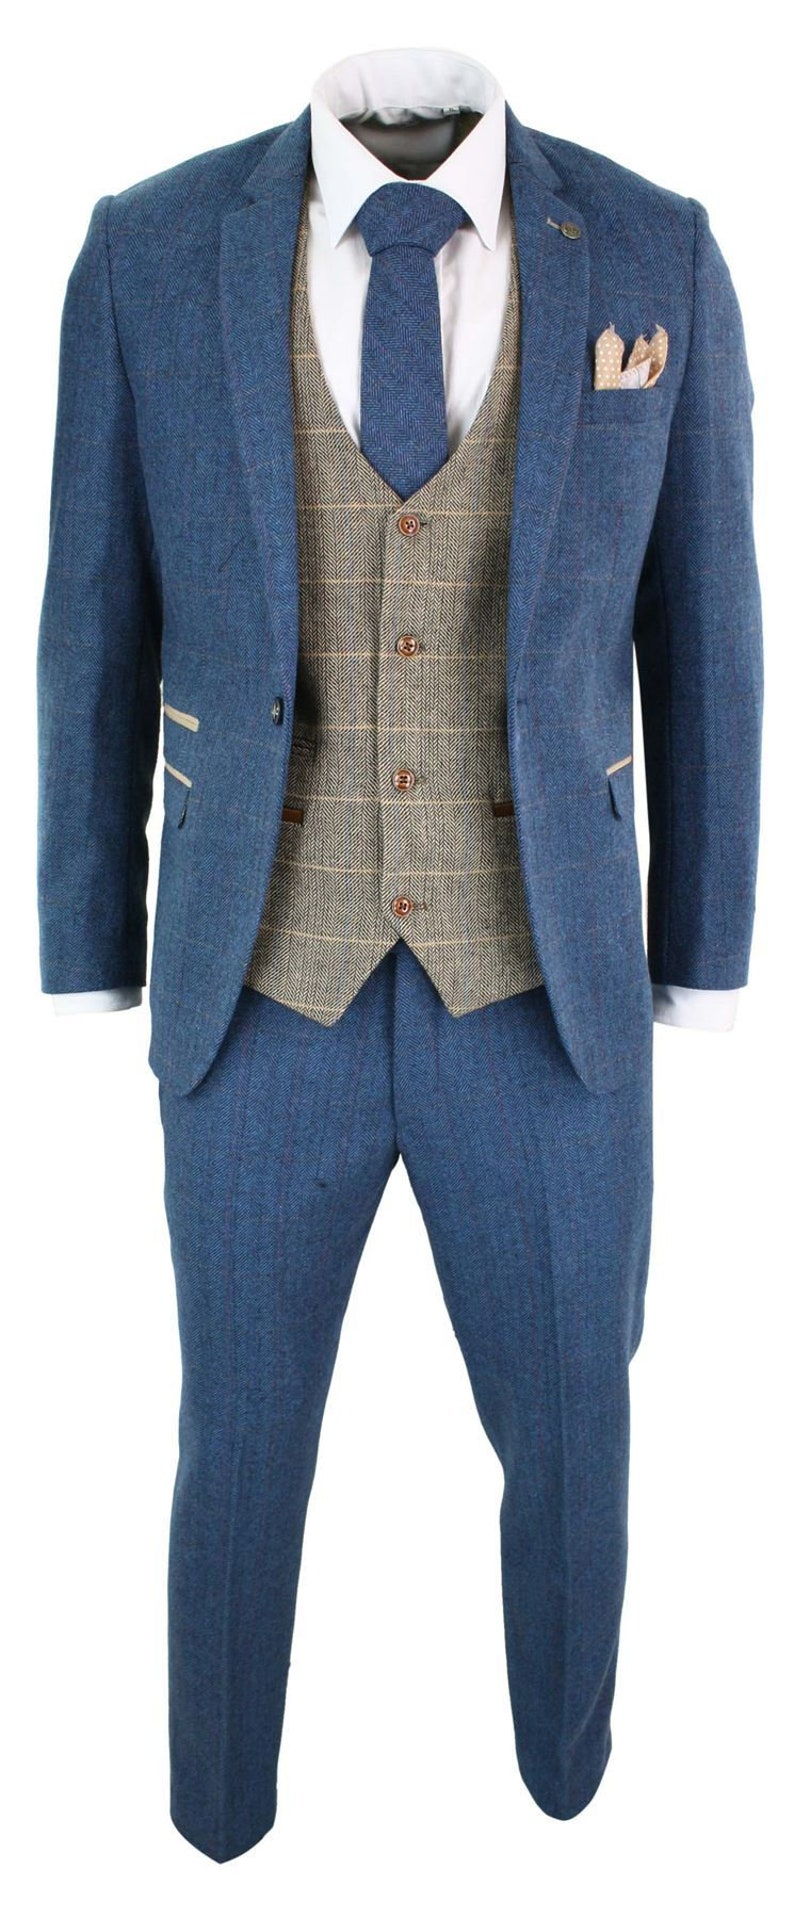 Men's Vintage Clothing | Retro Clothing for Men     Mens blue tan brown 3 piece herringbone tweed check vintage tailored fit suit - blue $350.56 AT vintagedancer.com